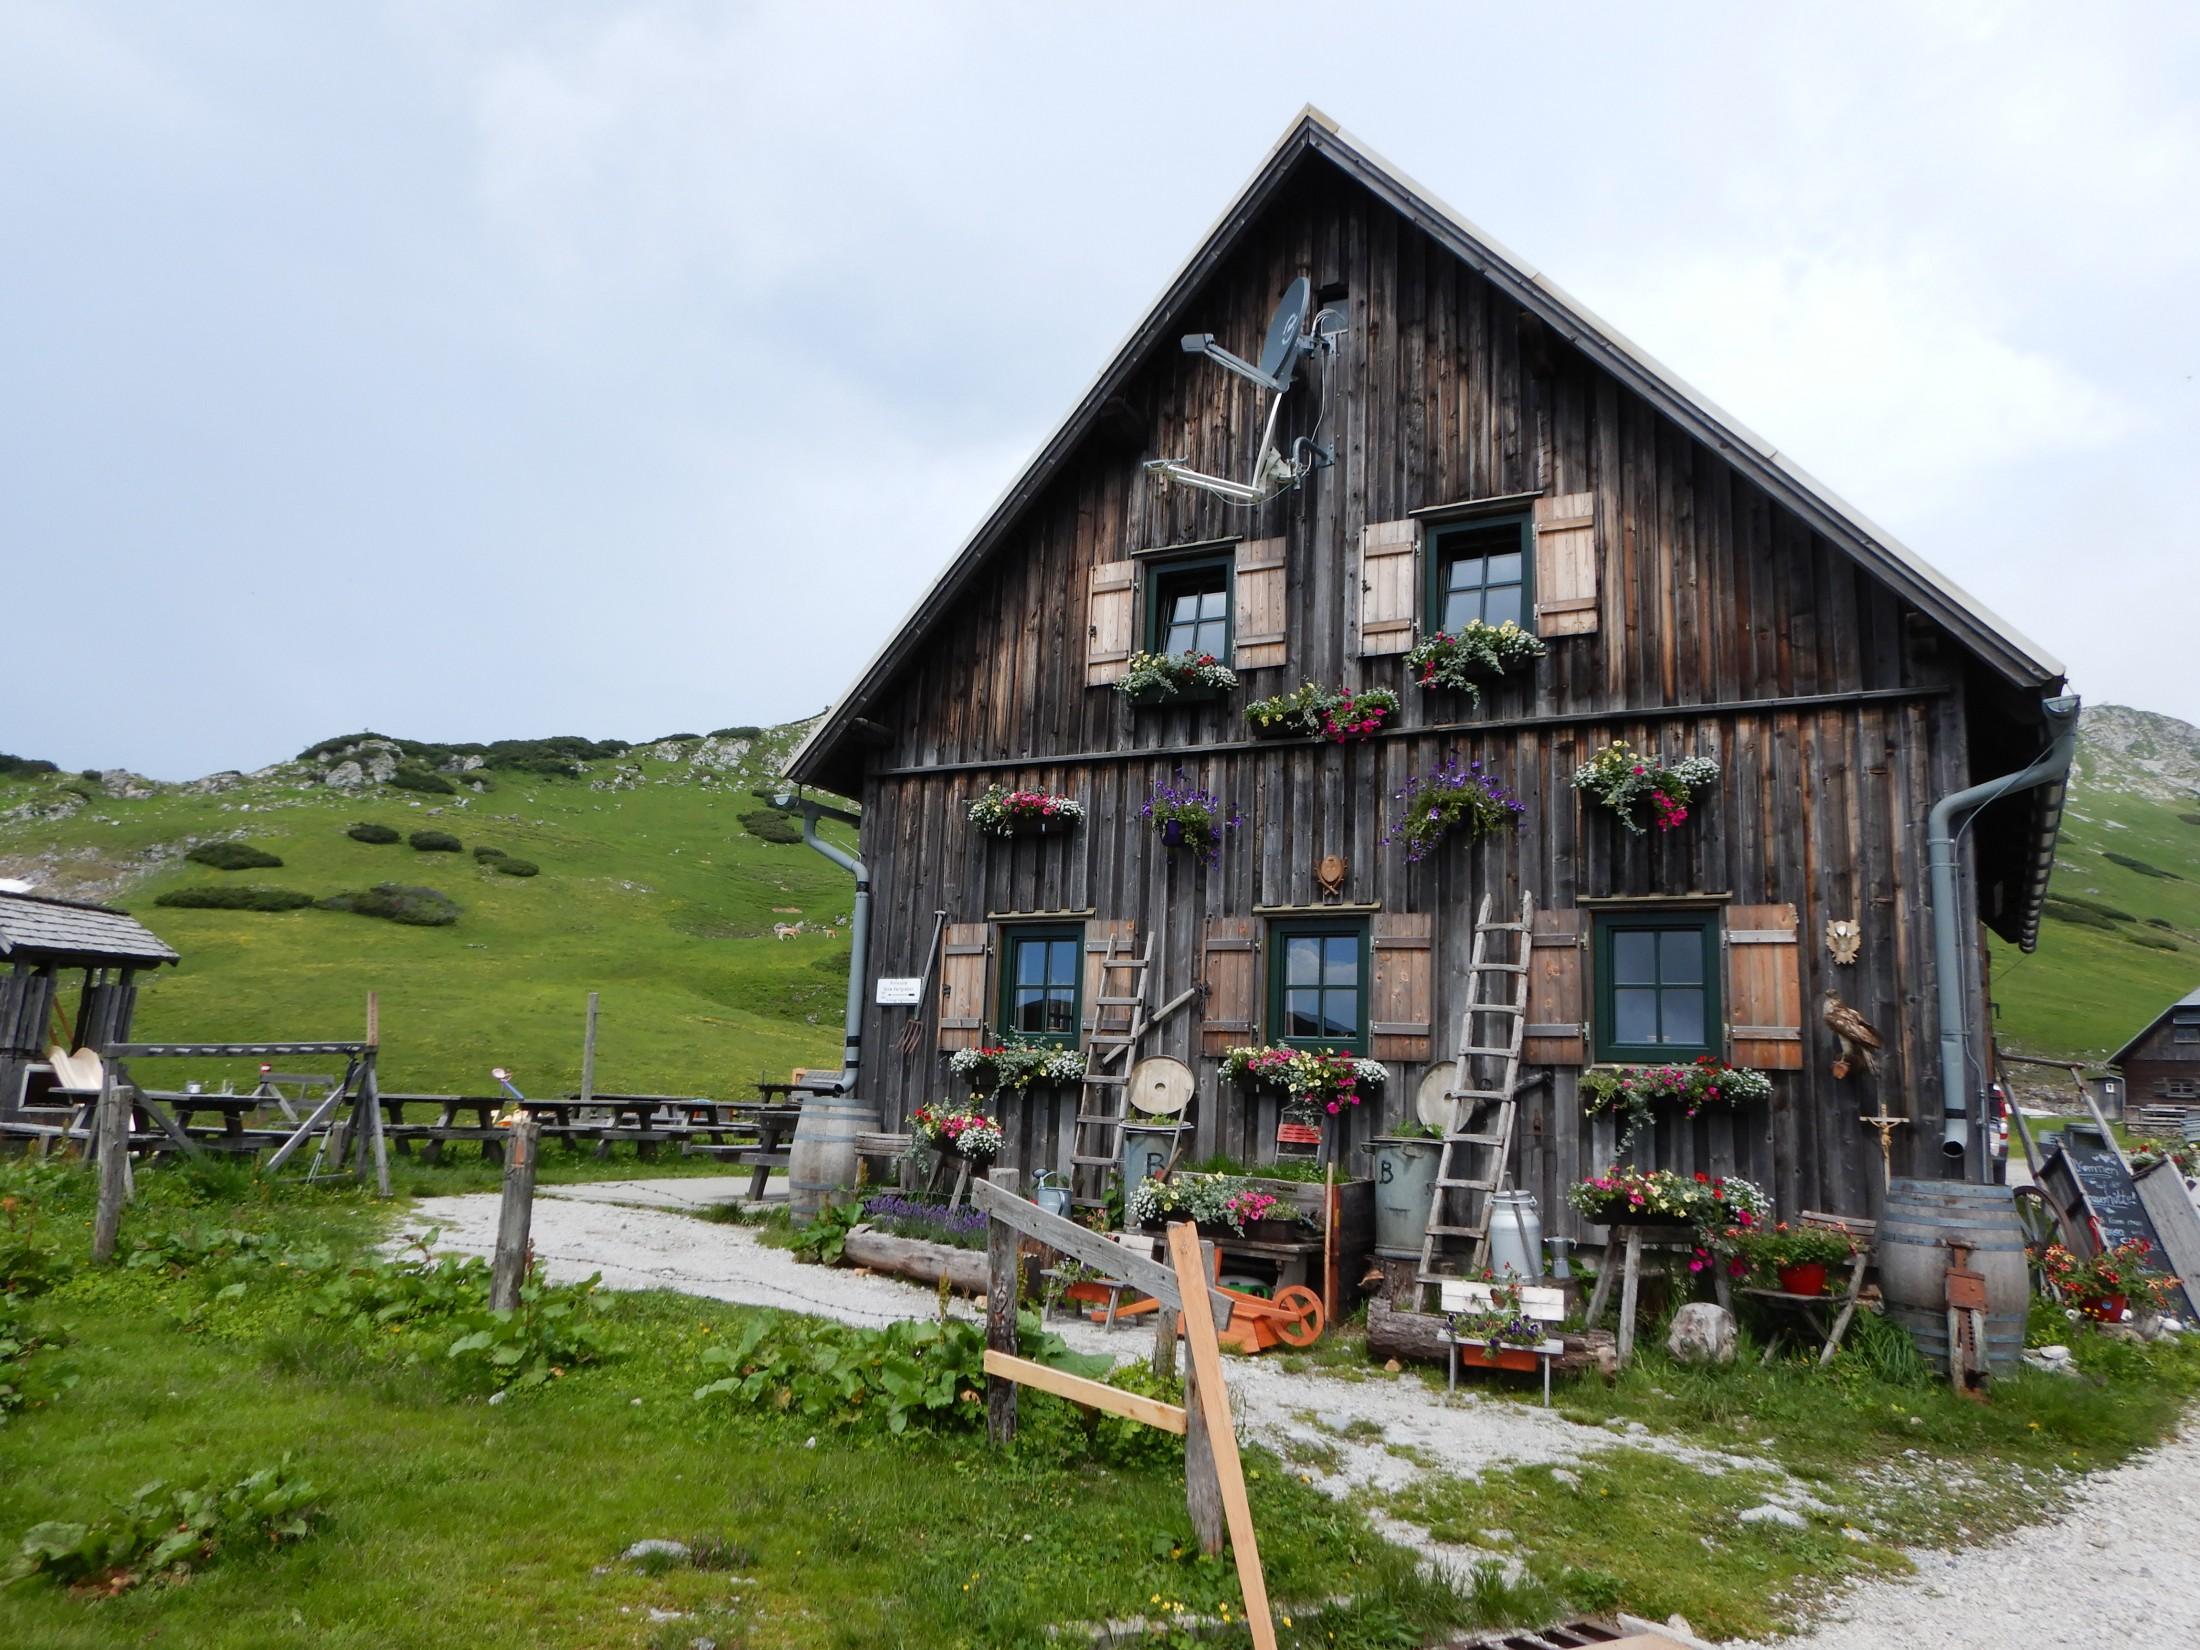 Bergwaldprojekt Schneealm (10.06.2018 bis 16.06.2018)